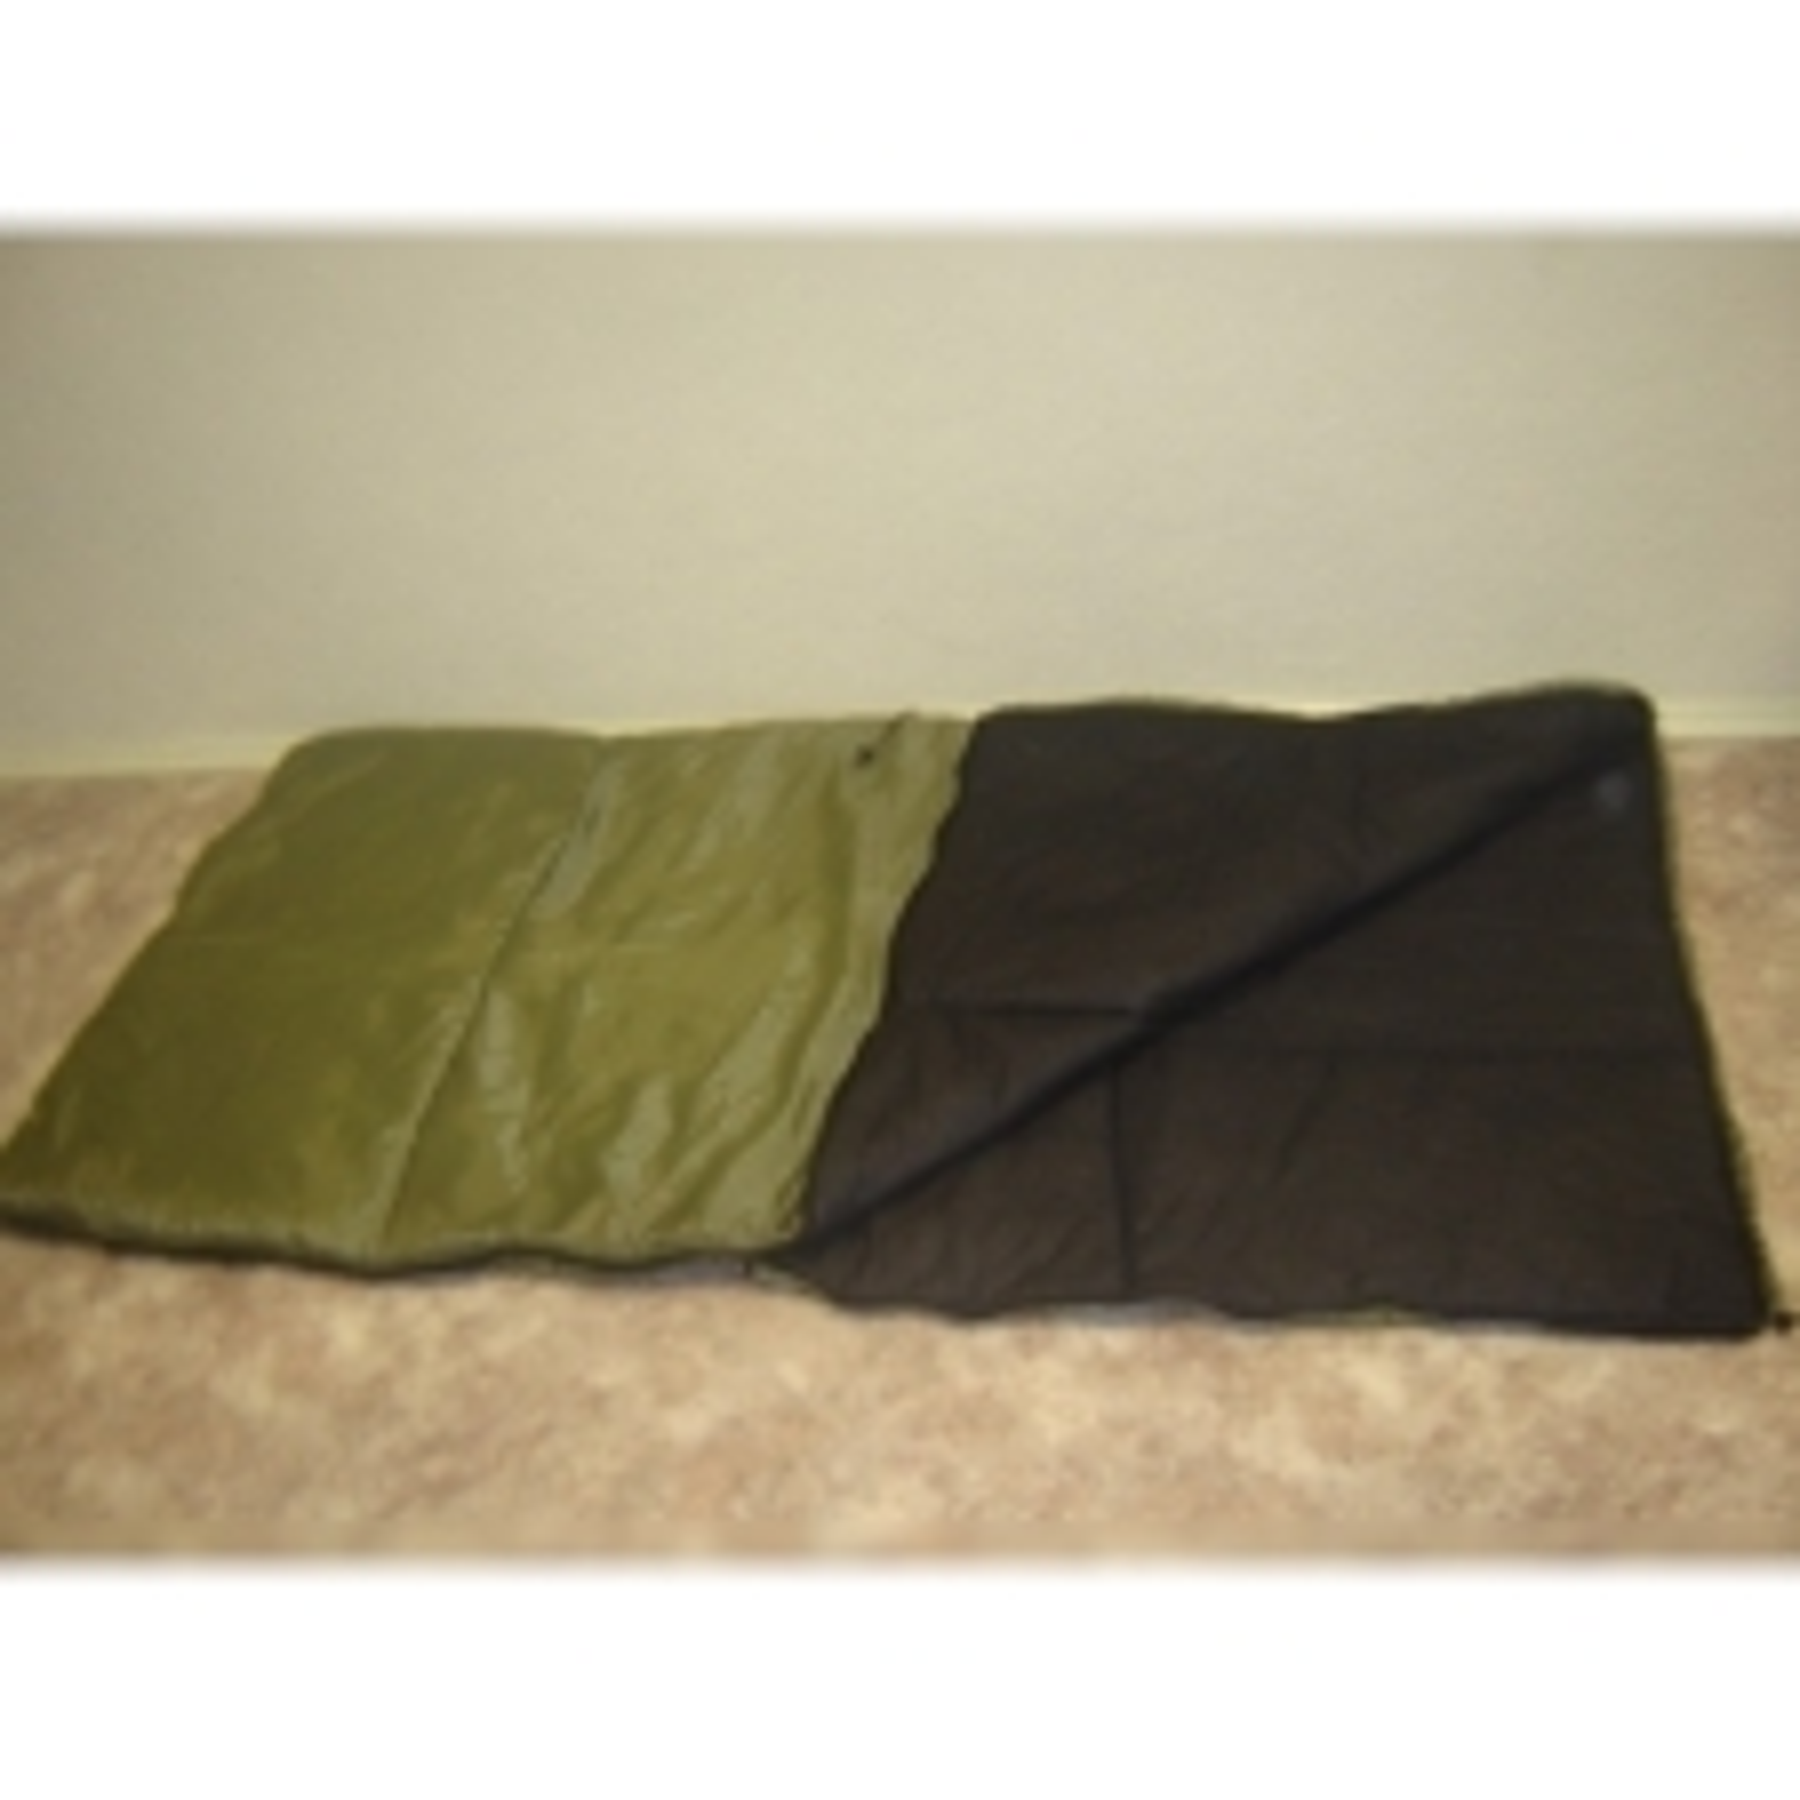 Спальник-одеяло Тверь СО2 Тафета/Тафета синт. 2 сл. (+10/+25)